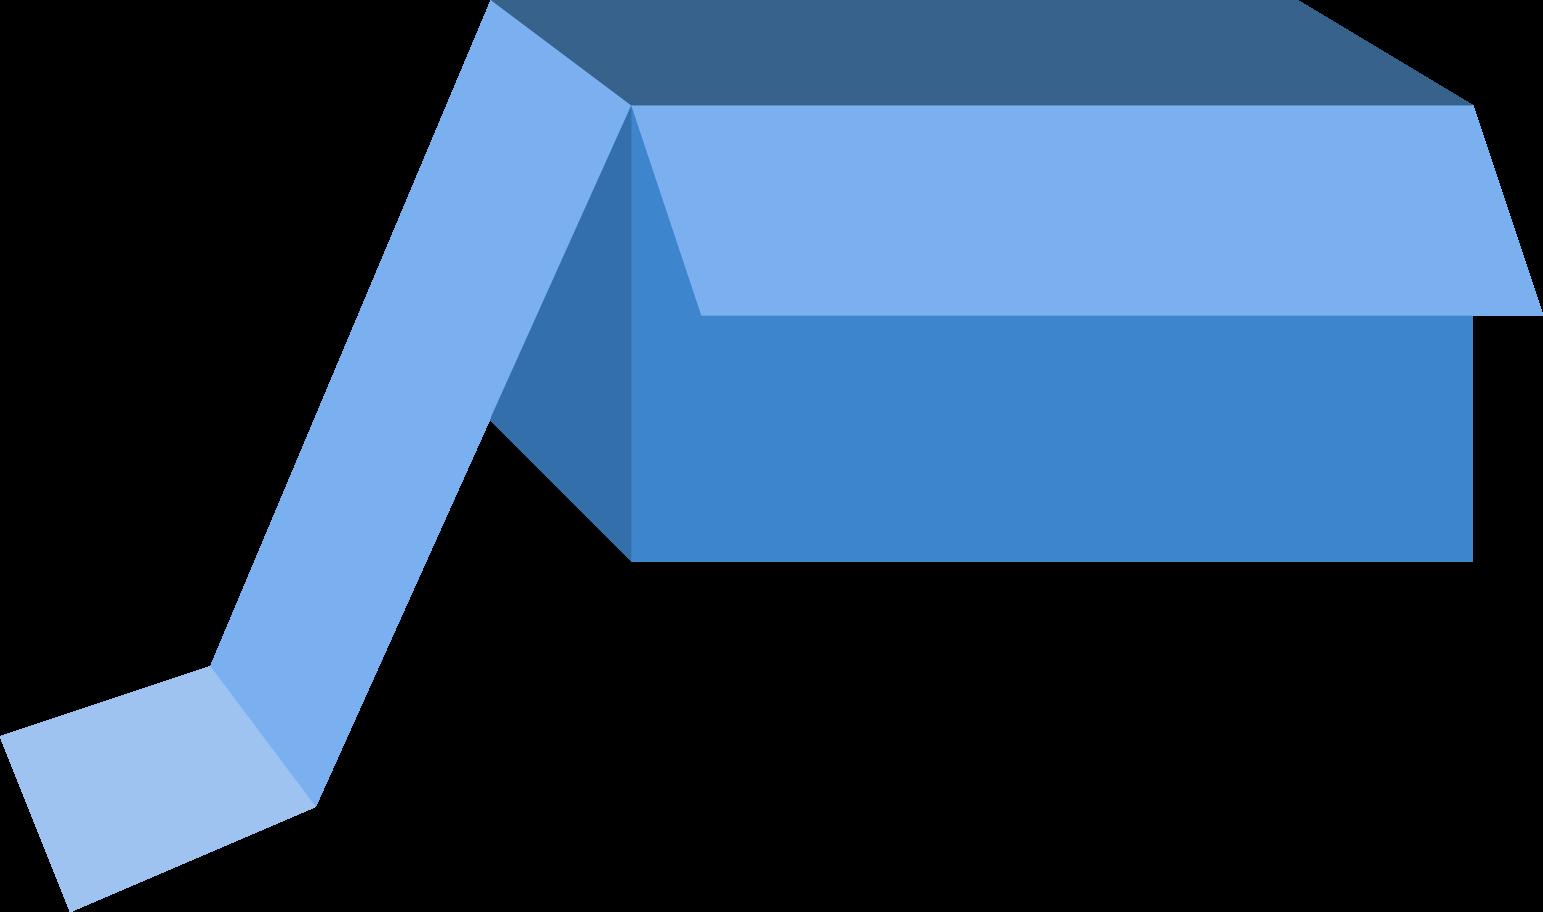 box blue Clipart illustration in PNG, SVG